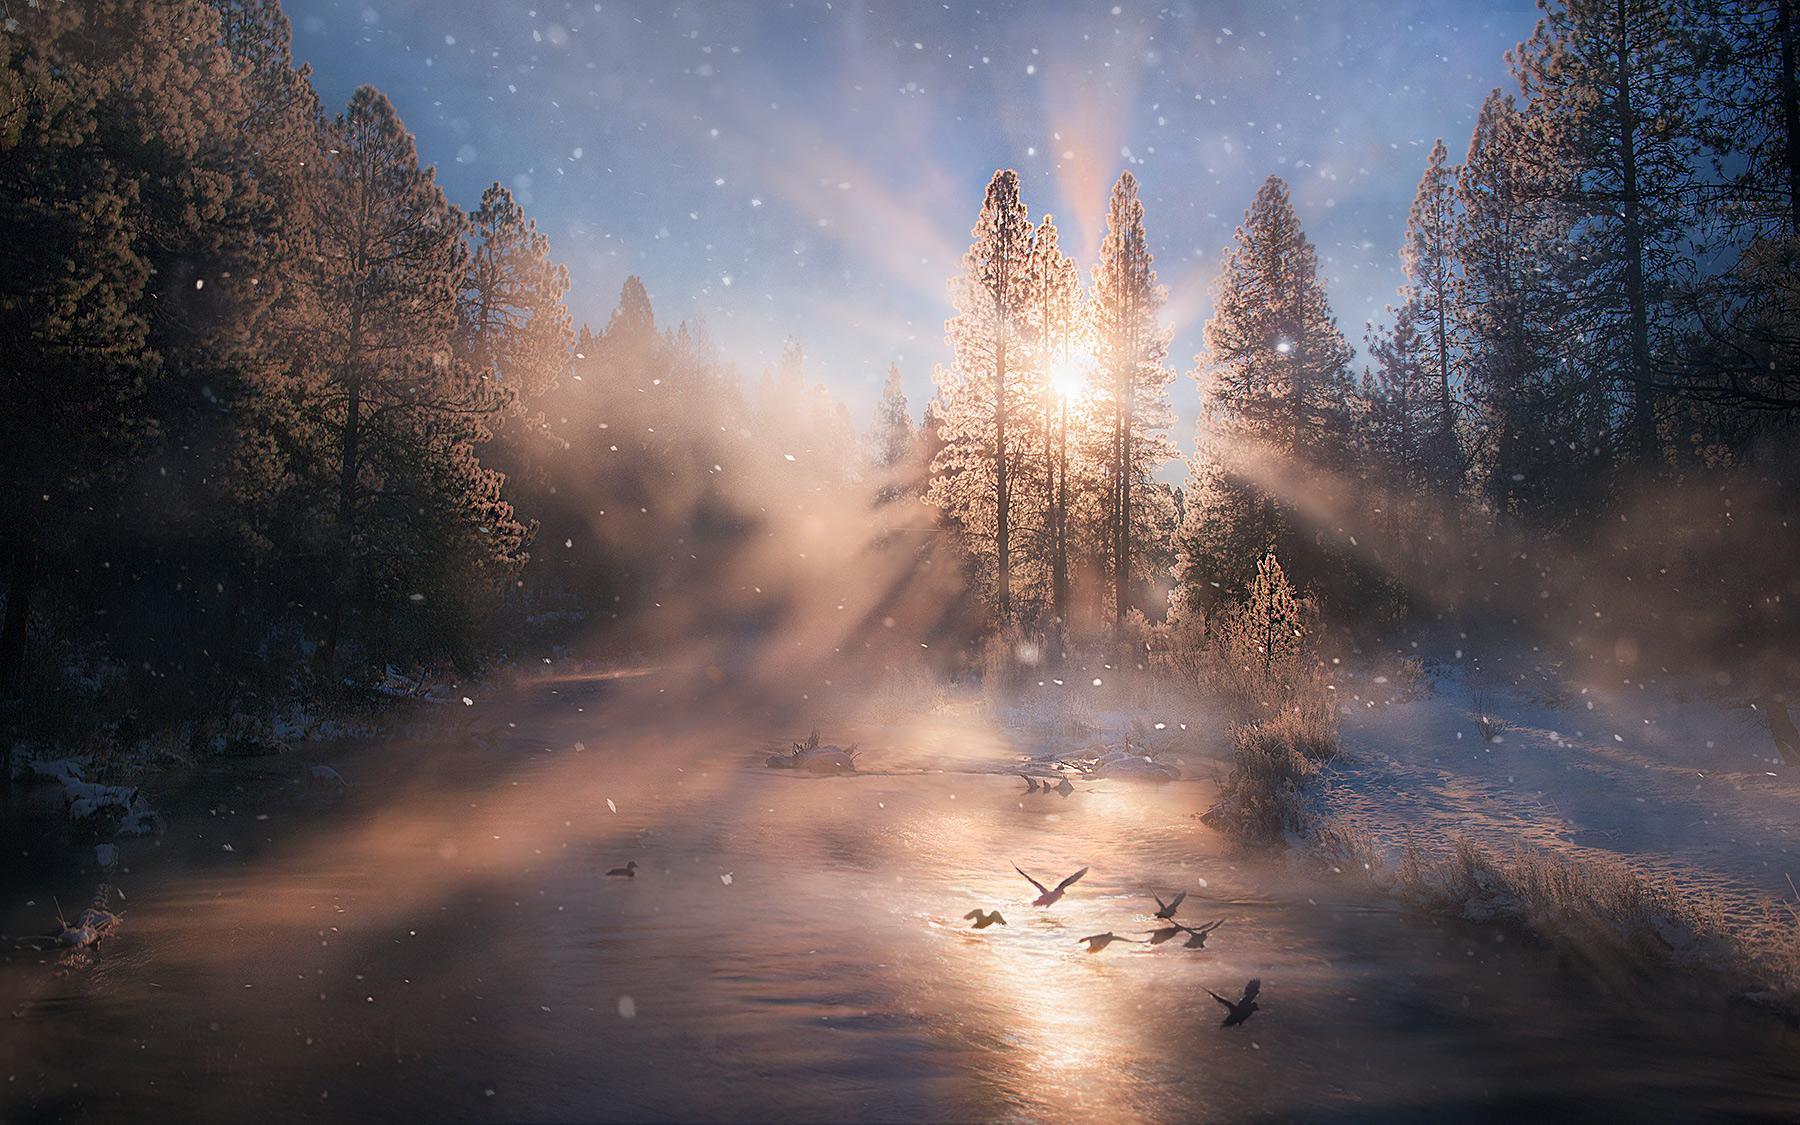 Klamath, oregon, winter, cold, photo